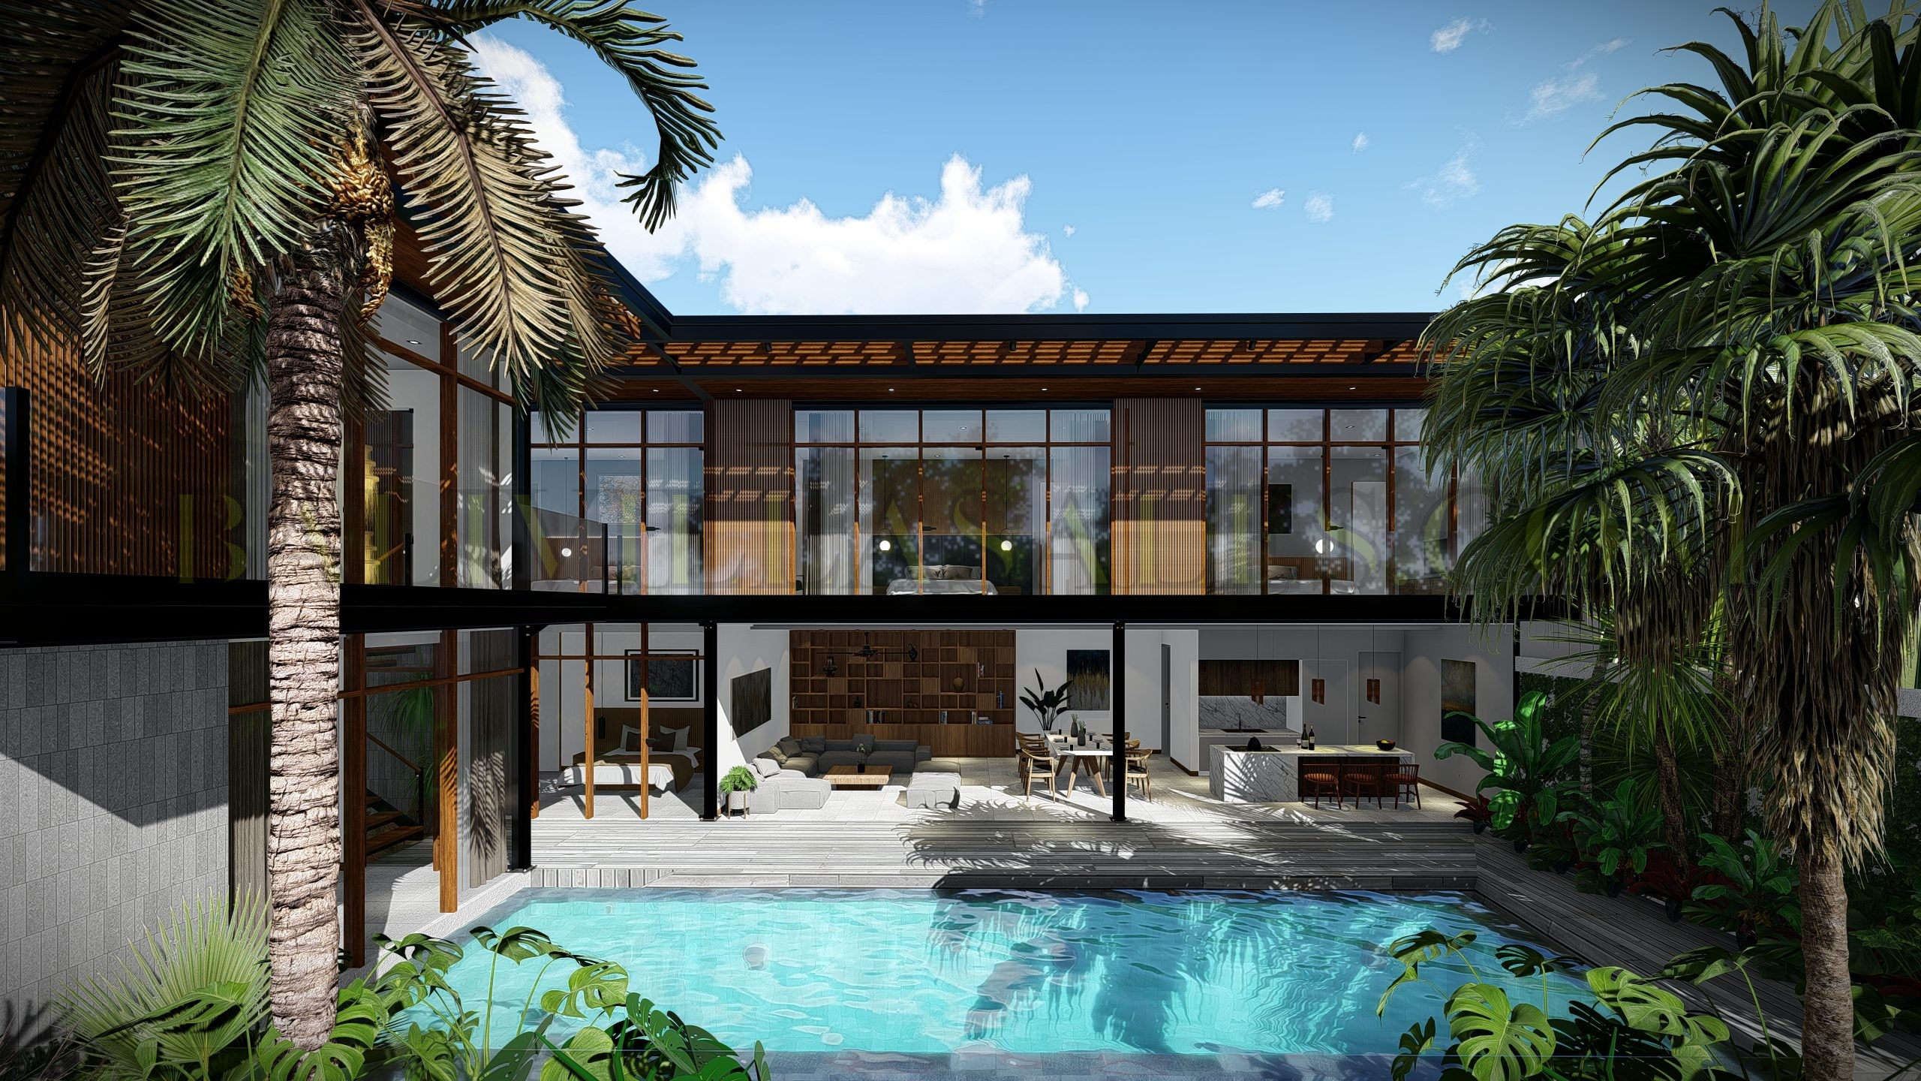 Canggu optimal Turn-Key Investment 4 bedroom villa